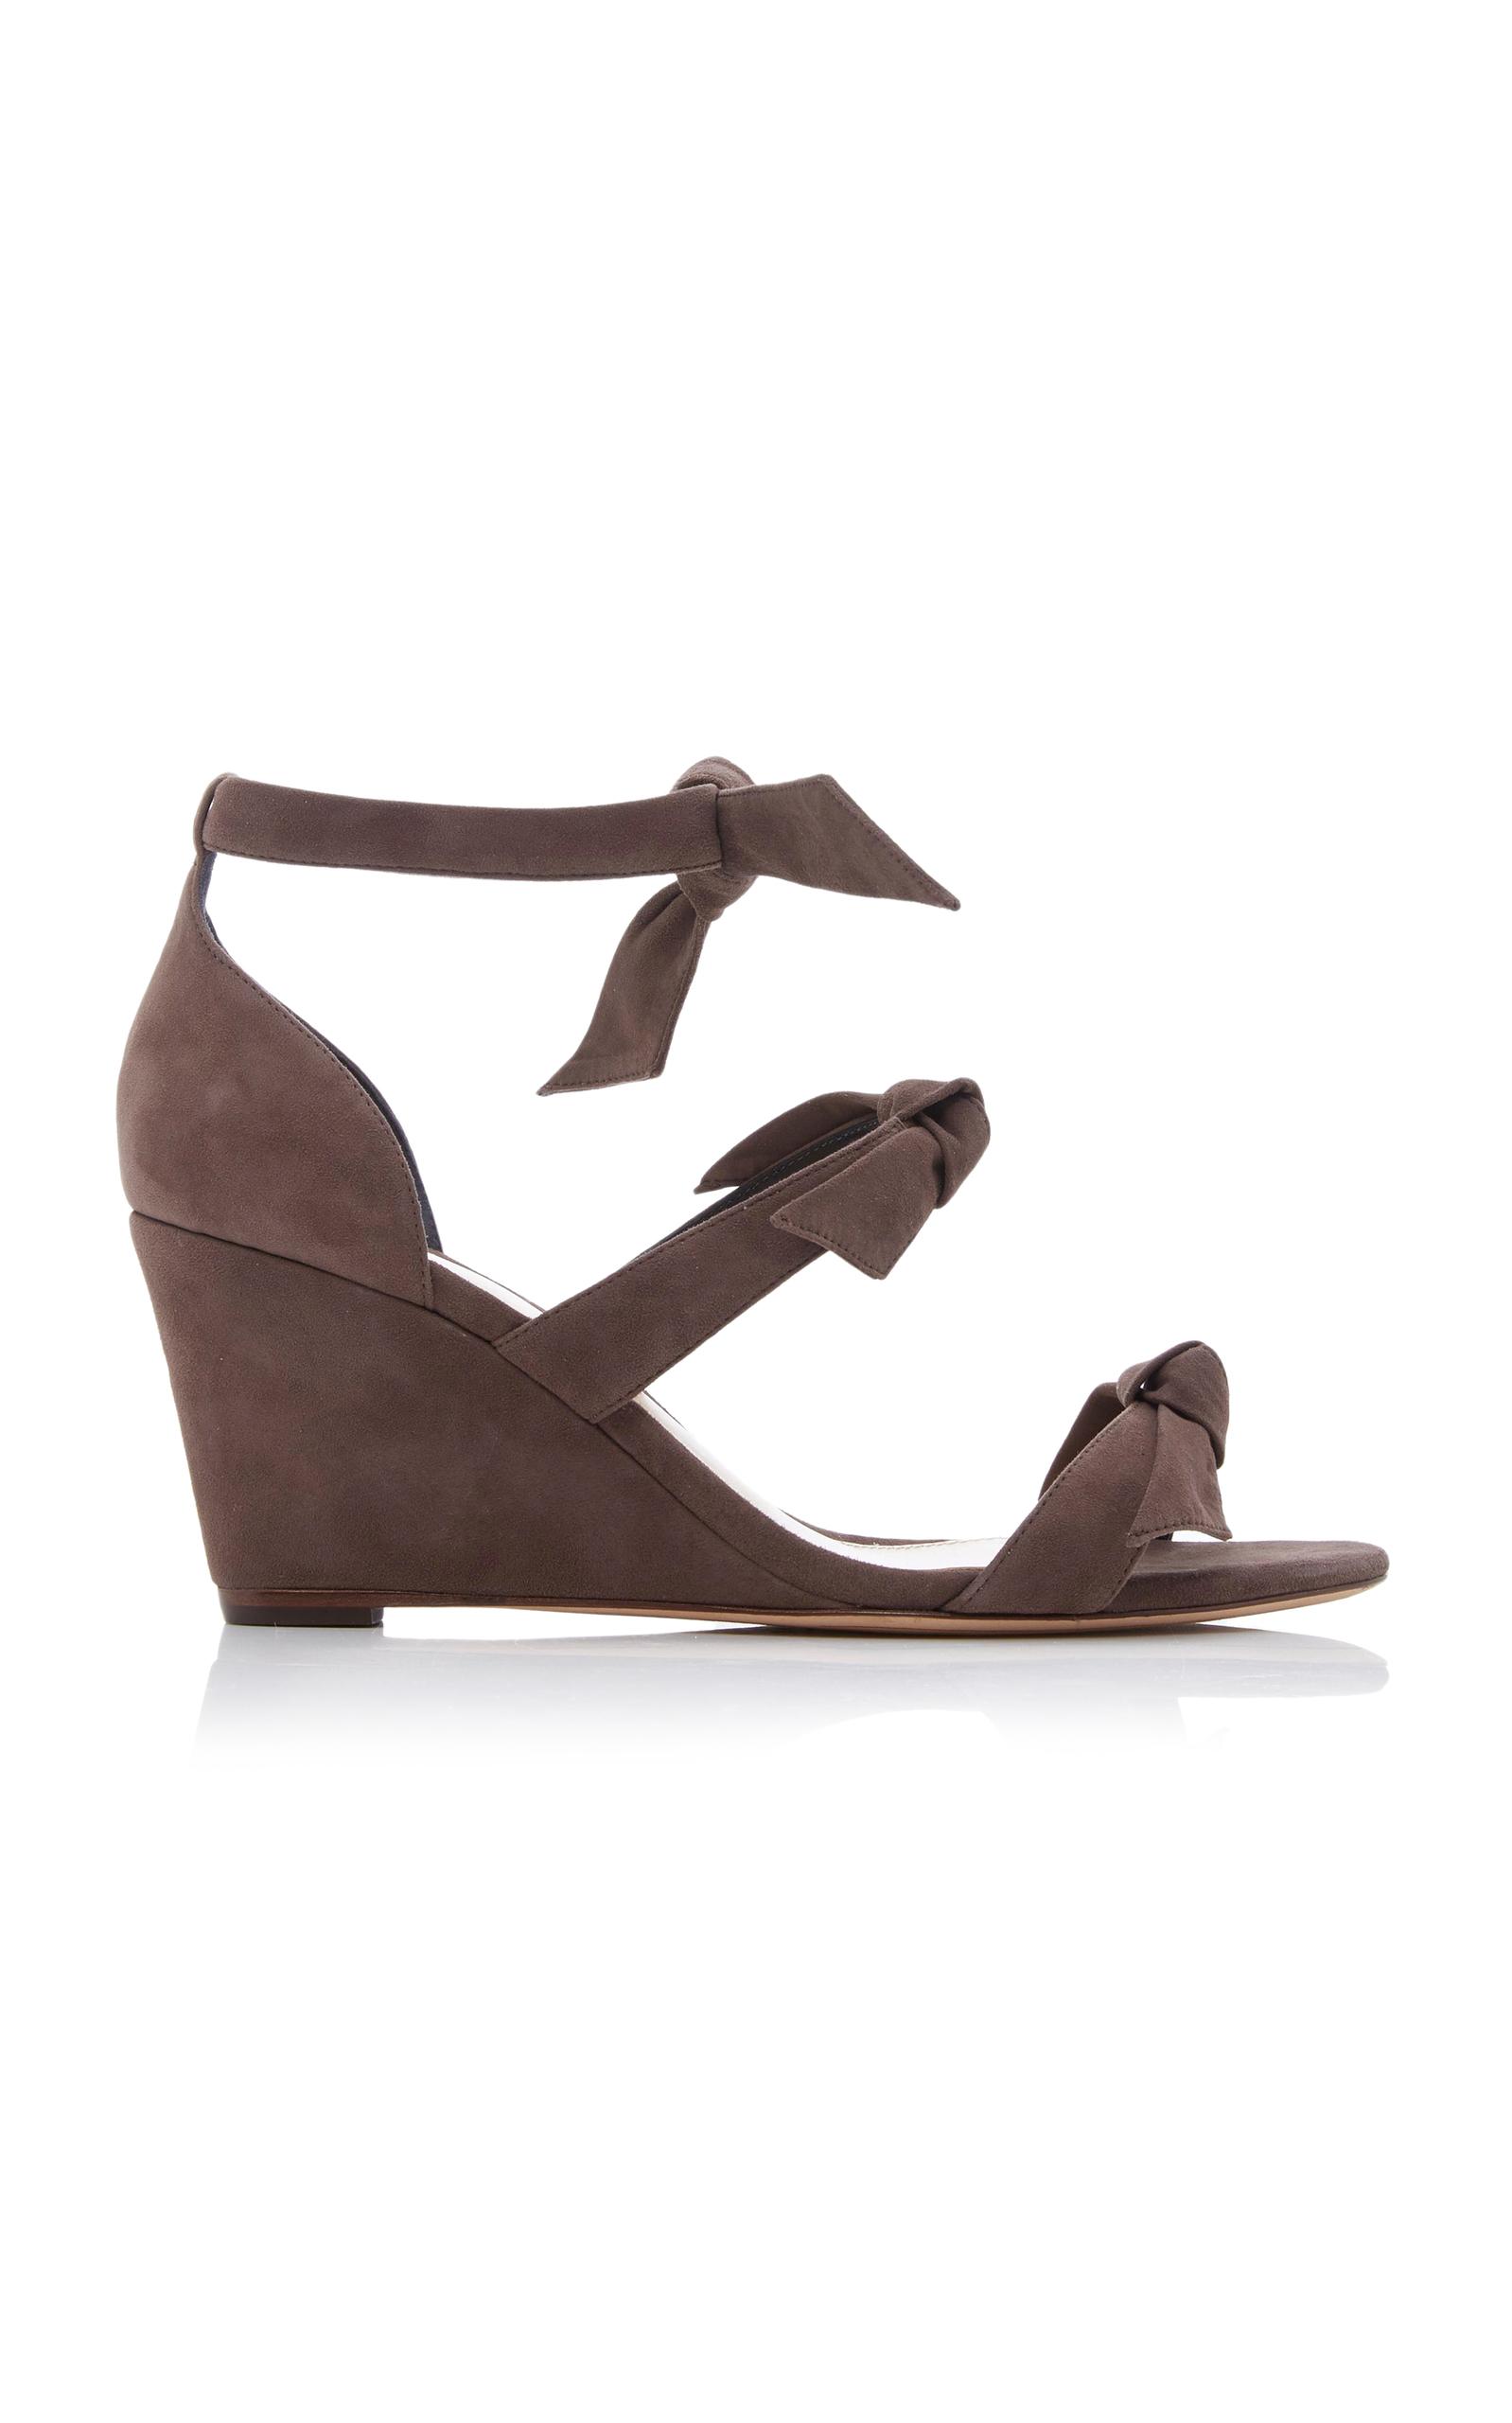 newest Alexandre Birman Gianna Suede Sandals buy cheap Cheapest qTaTs